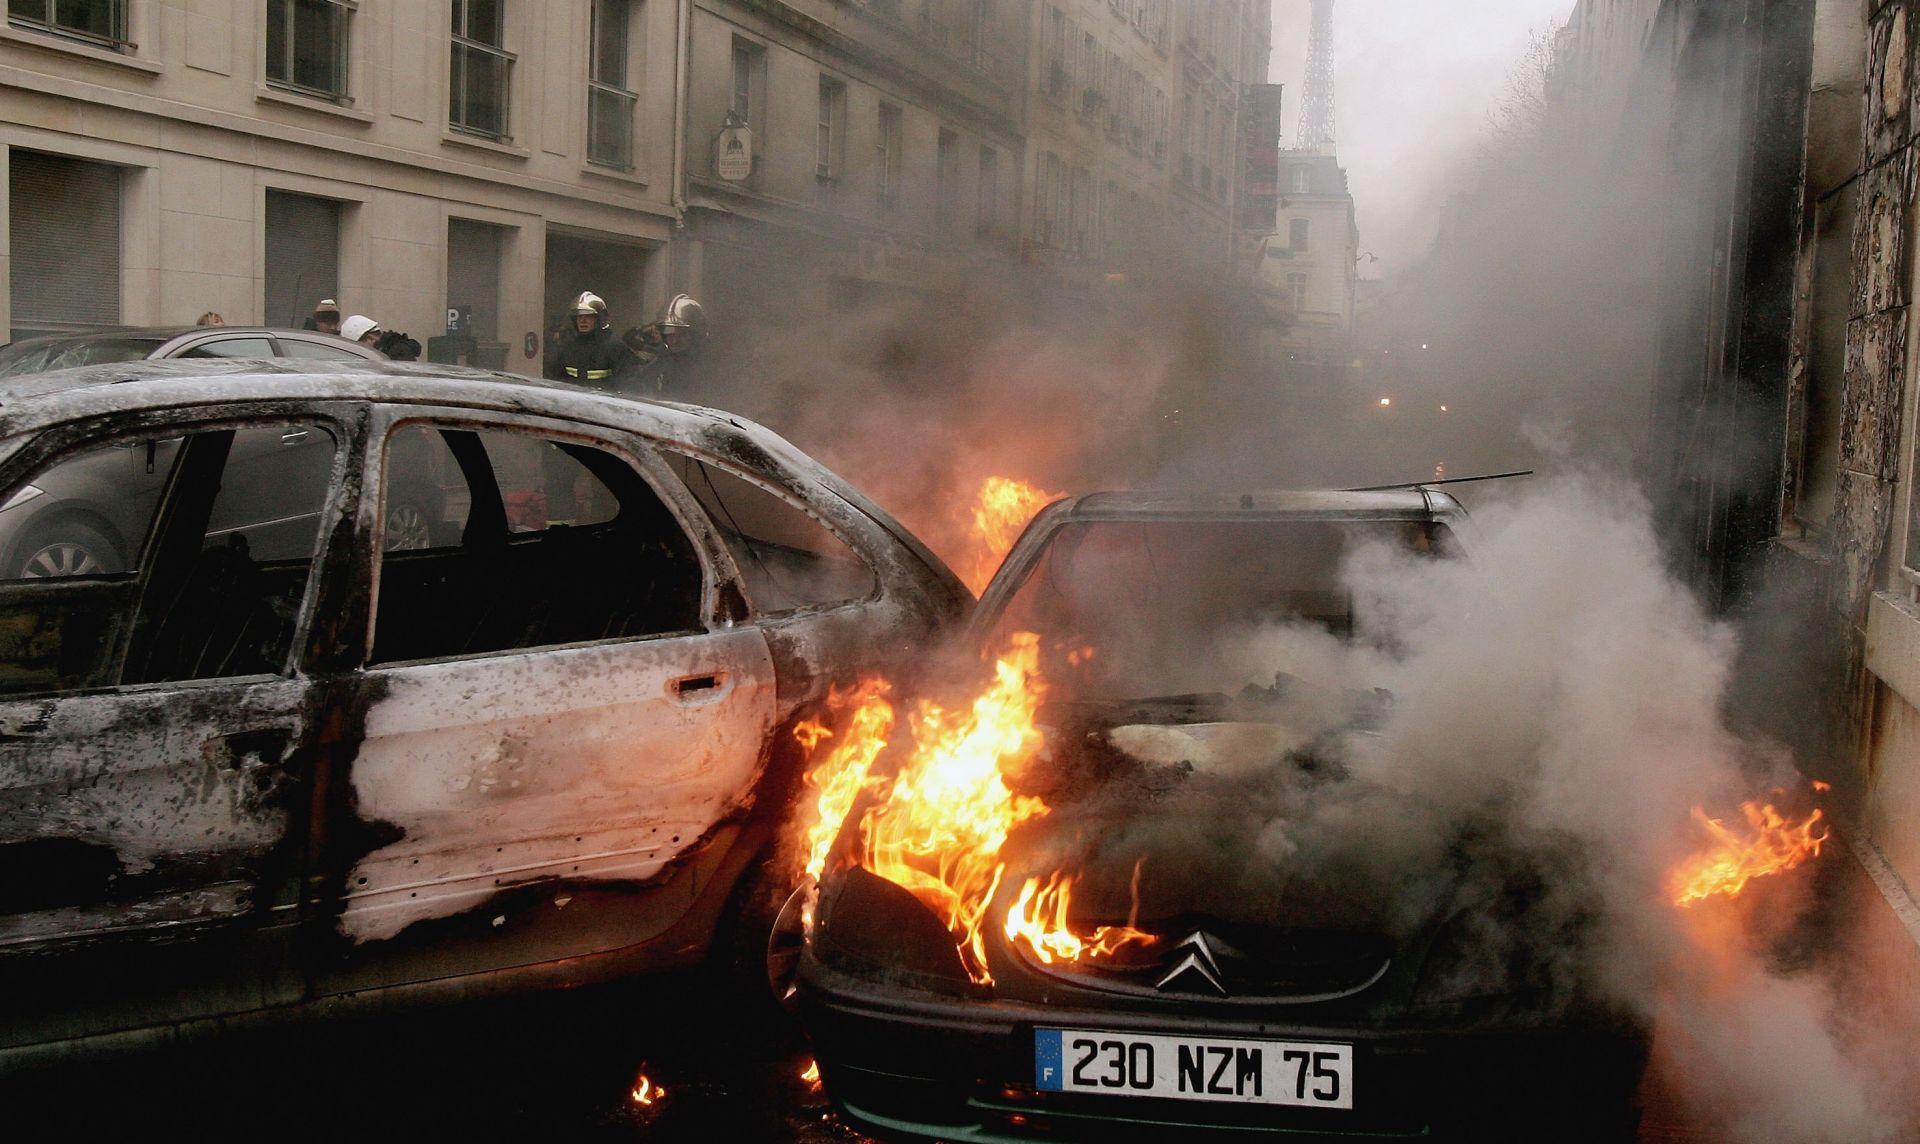 SVAKE GODINE ZA PAD BASTILLE U Francuskoj gorjelo preko 700 automobila